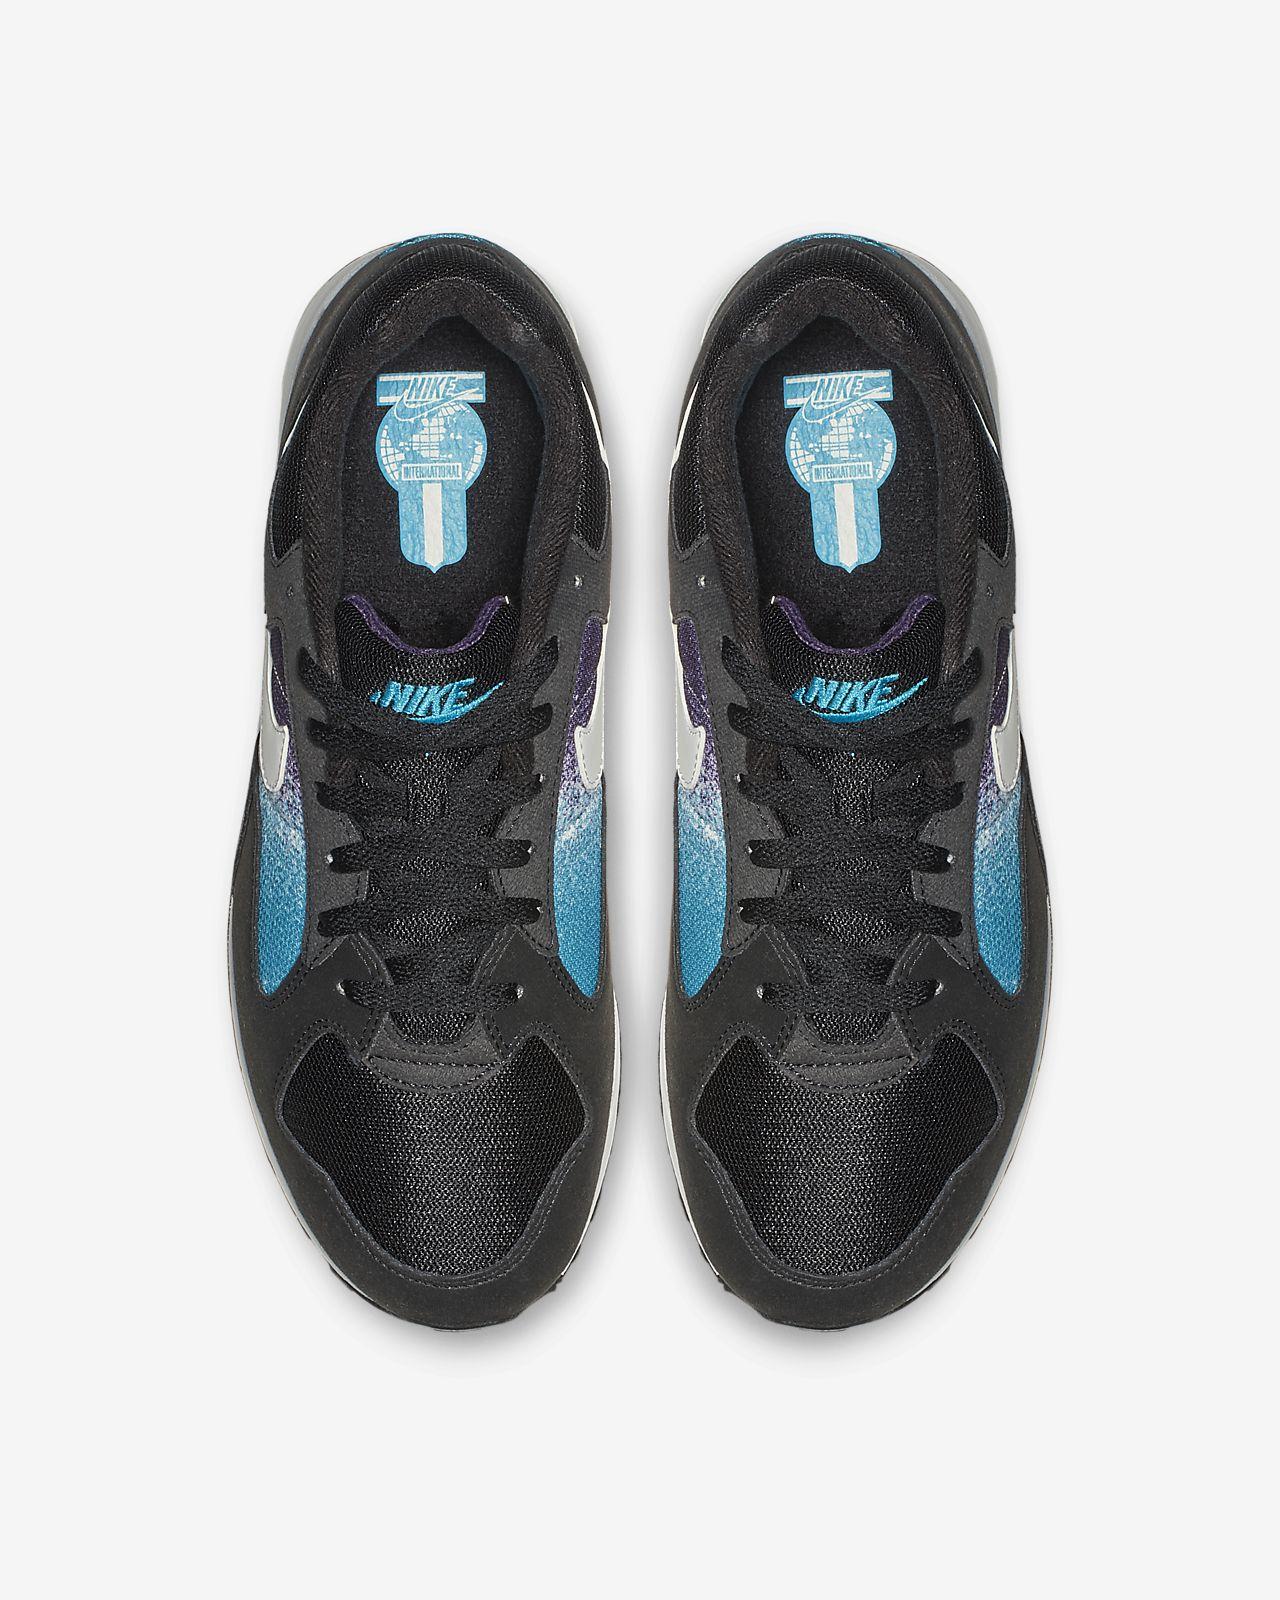 new product a9a7a 9b8d1 ... Nike Air Skylon II Men s Shoe